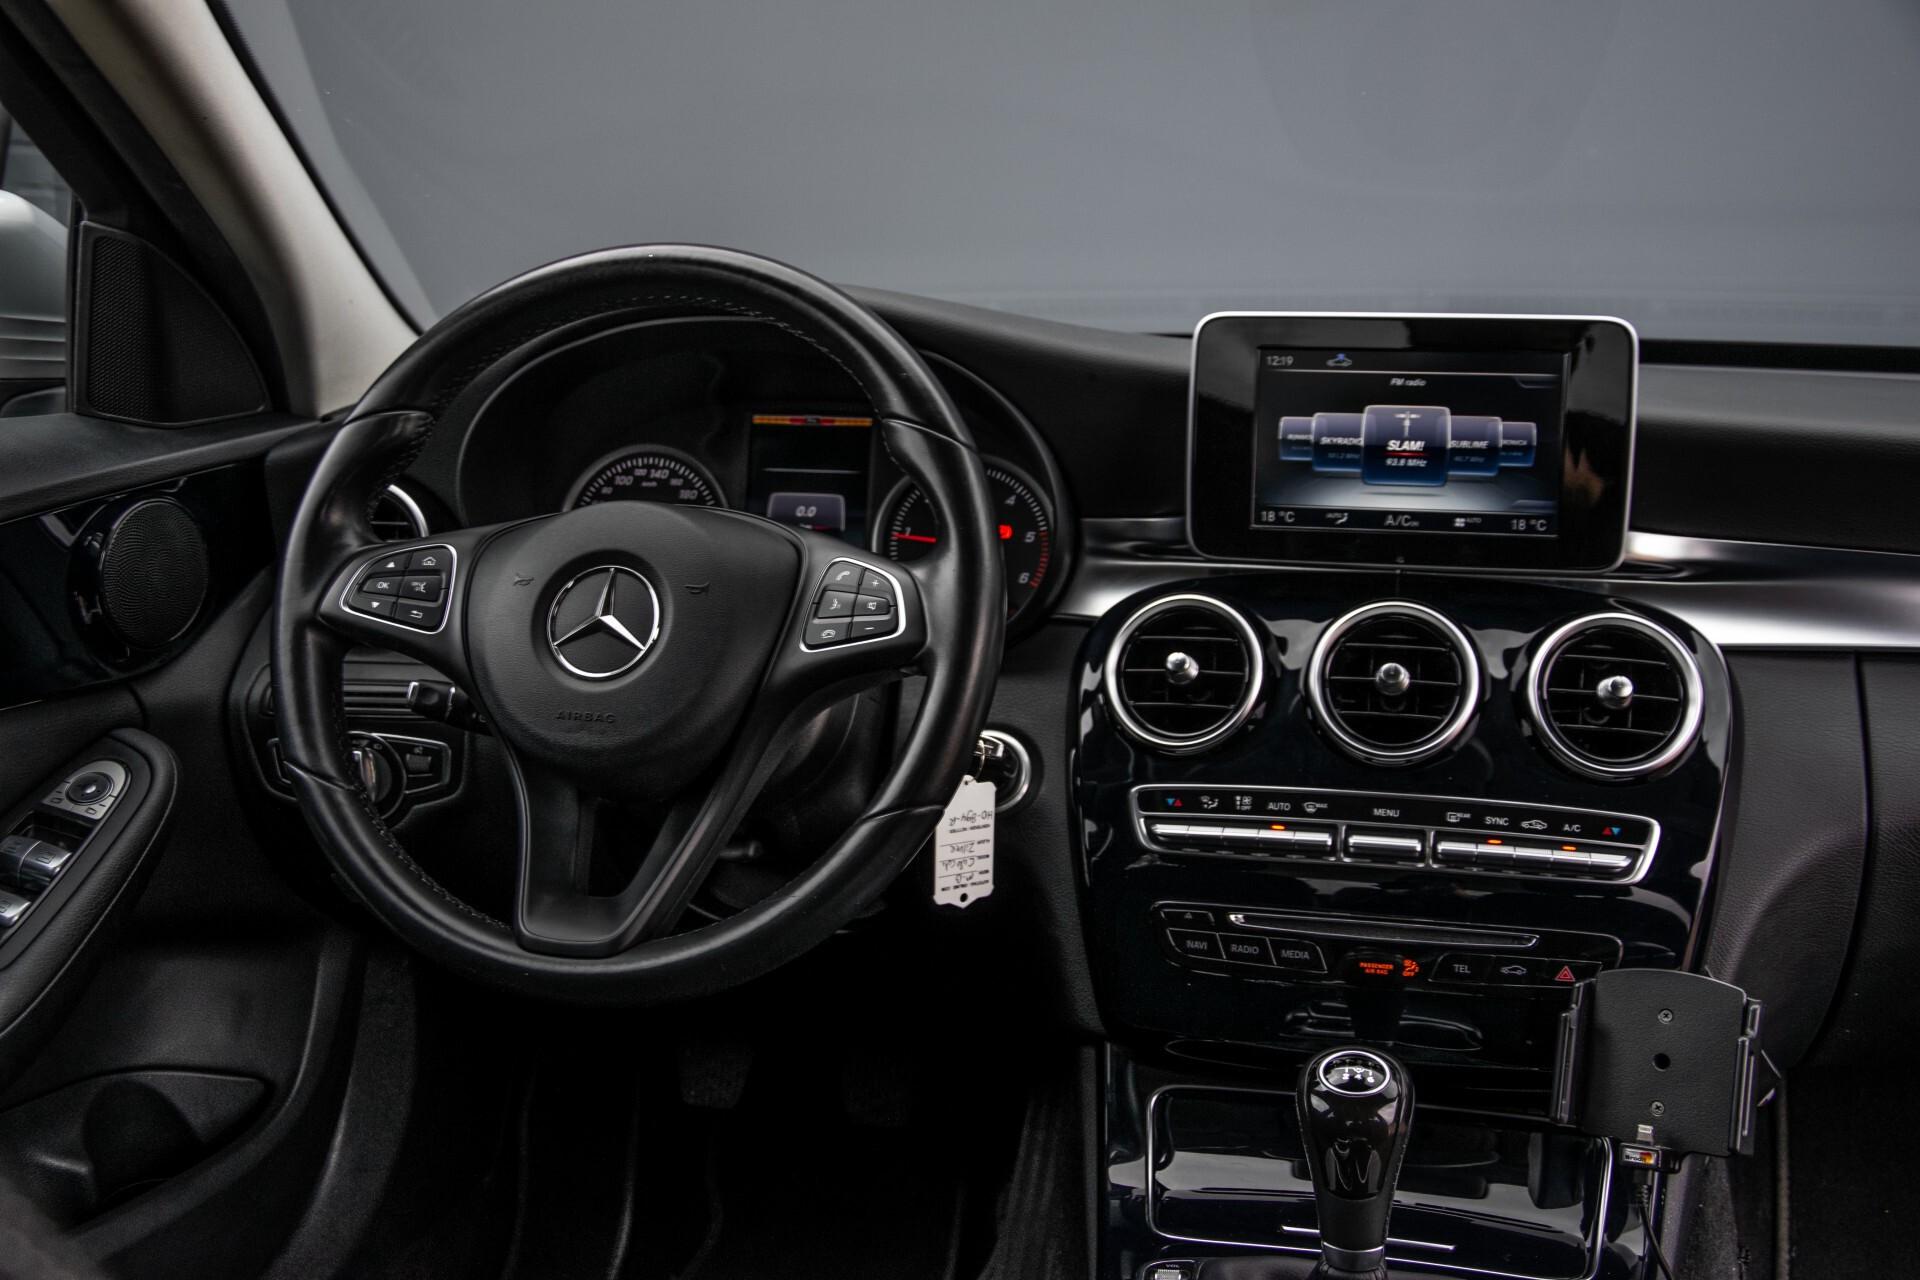 Mercedes-Benz C-Klasse 180 Bluetec Lease Edition Intelligent Light System/Cruise Control/Navi Foto 6